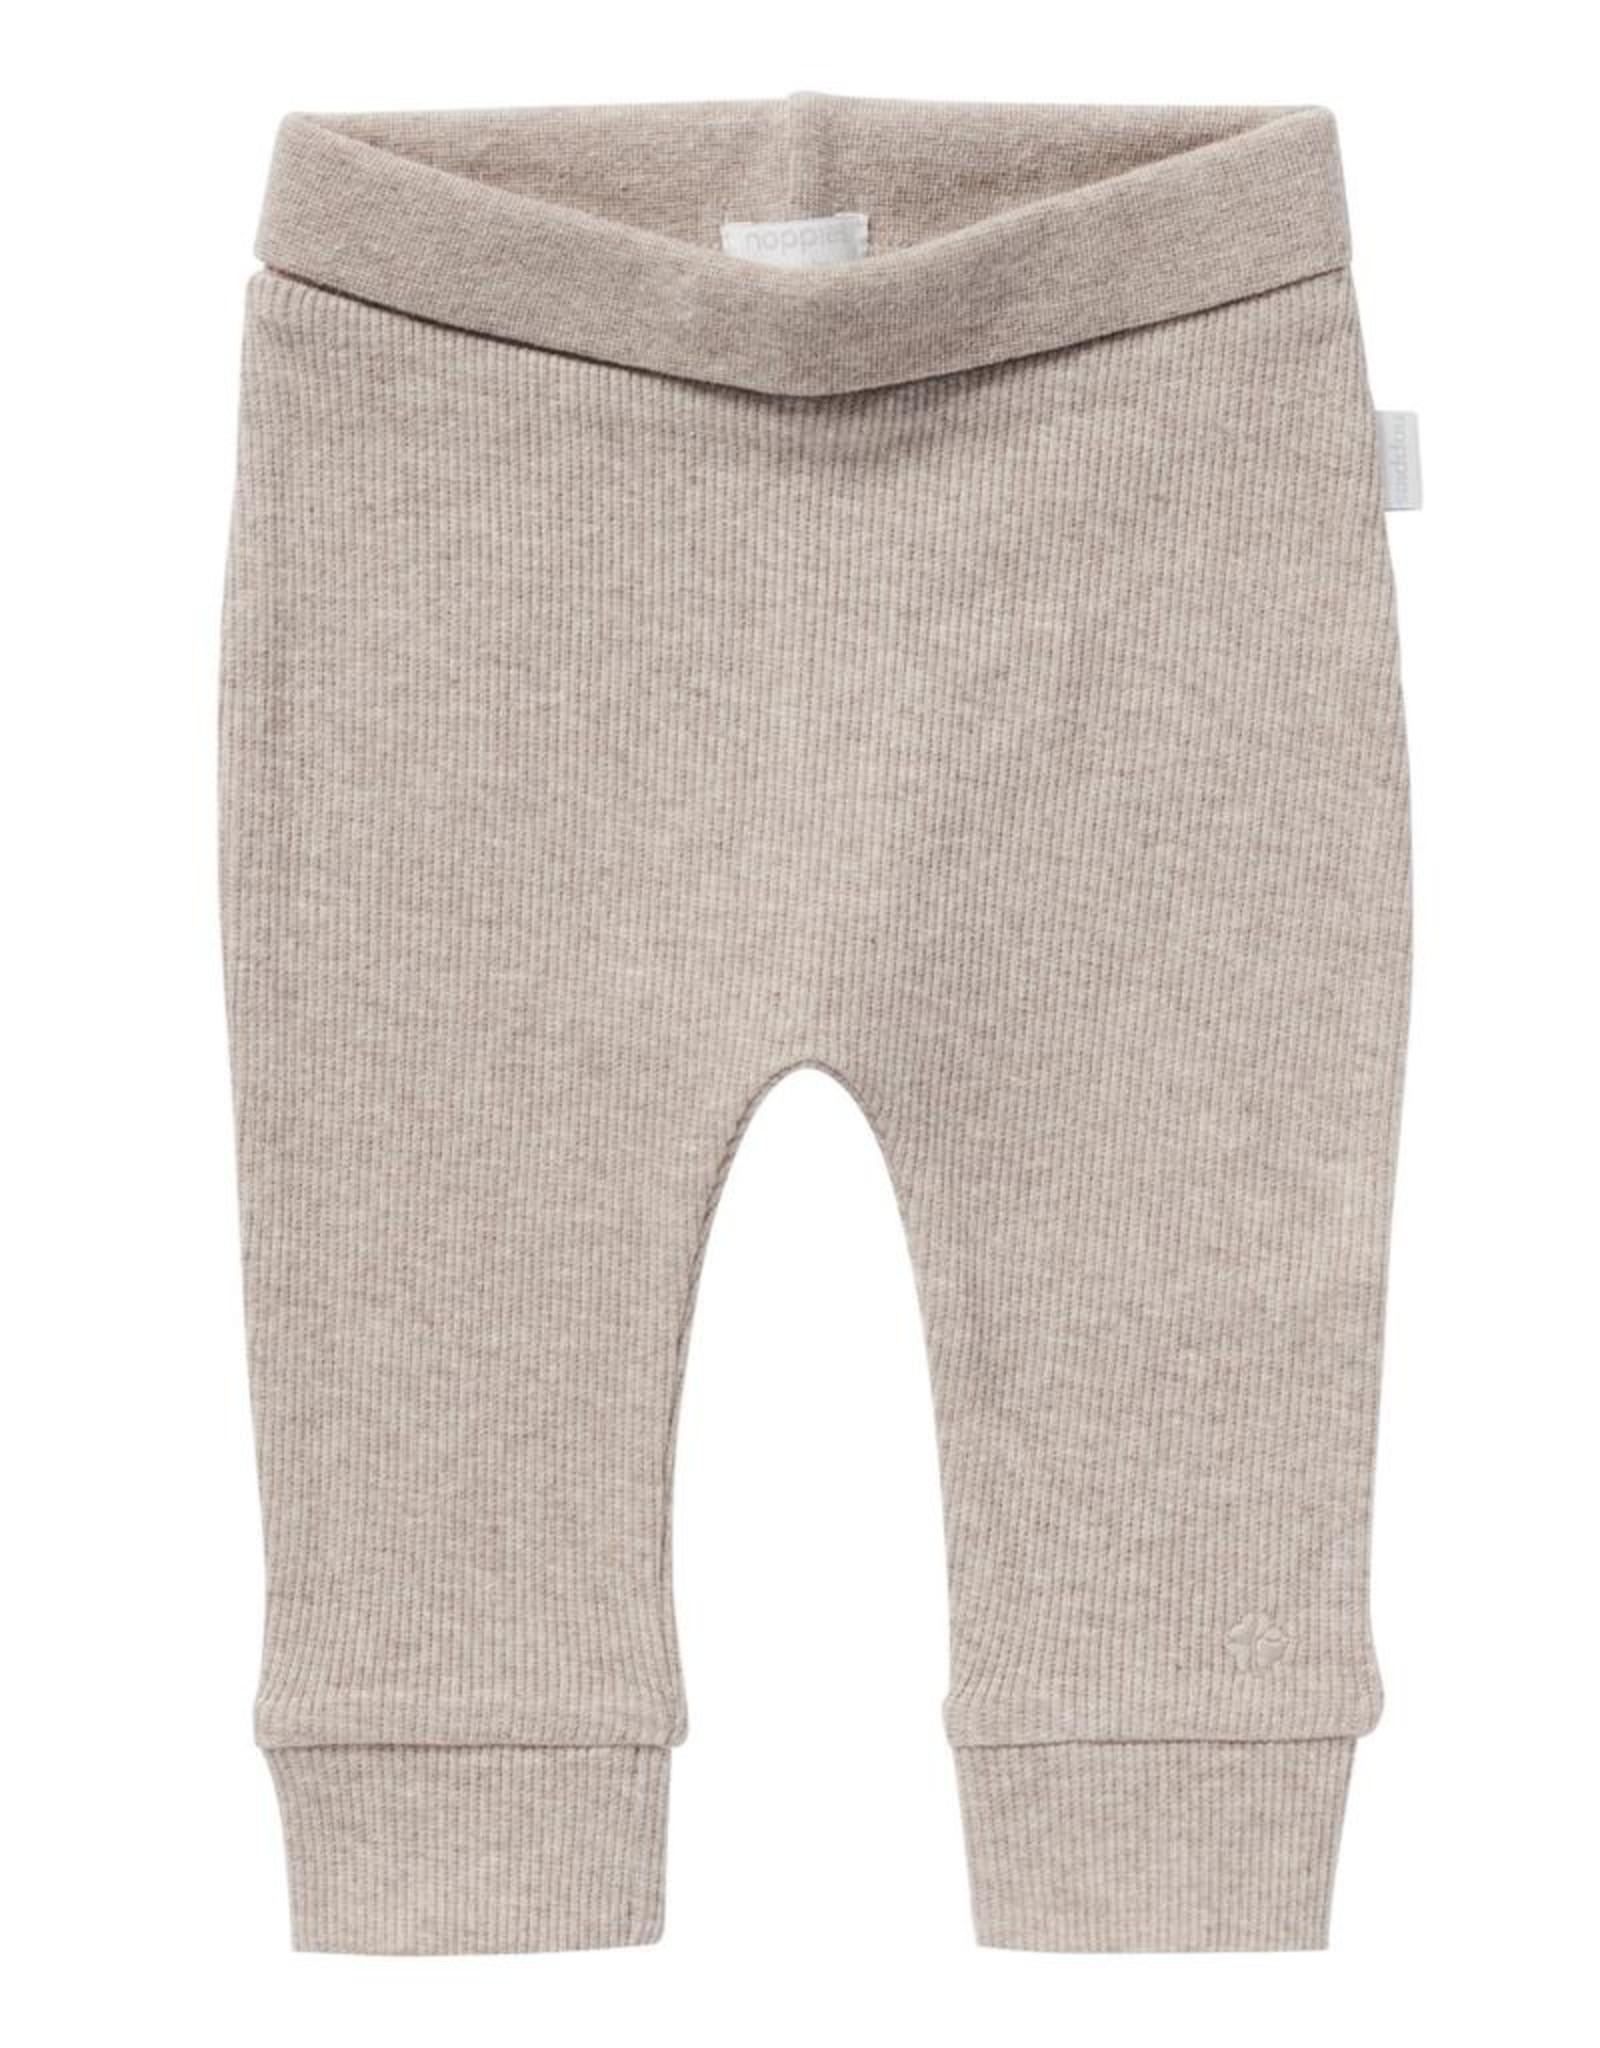 Noppies Kids Naura Ribbed Pants in Taupe